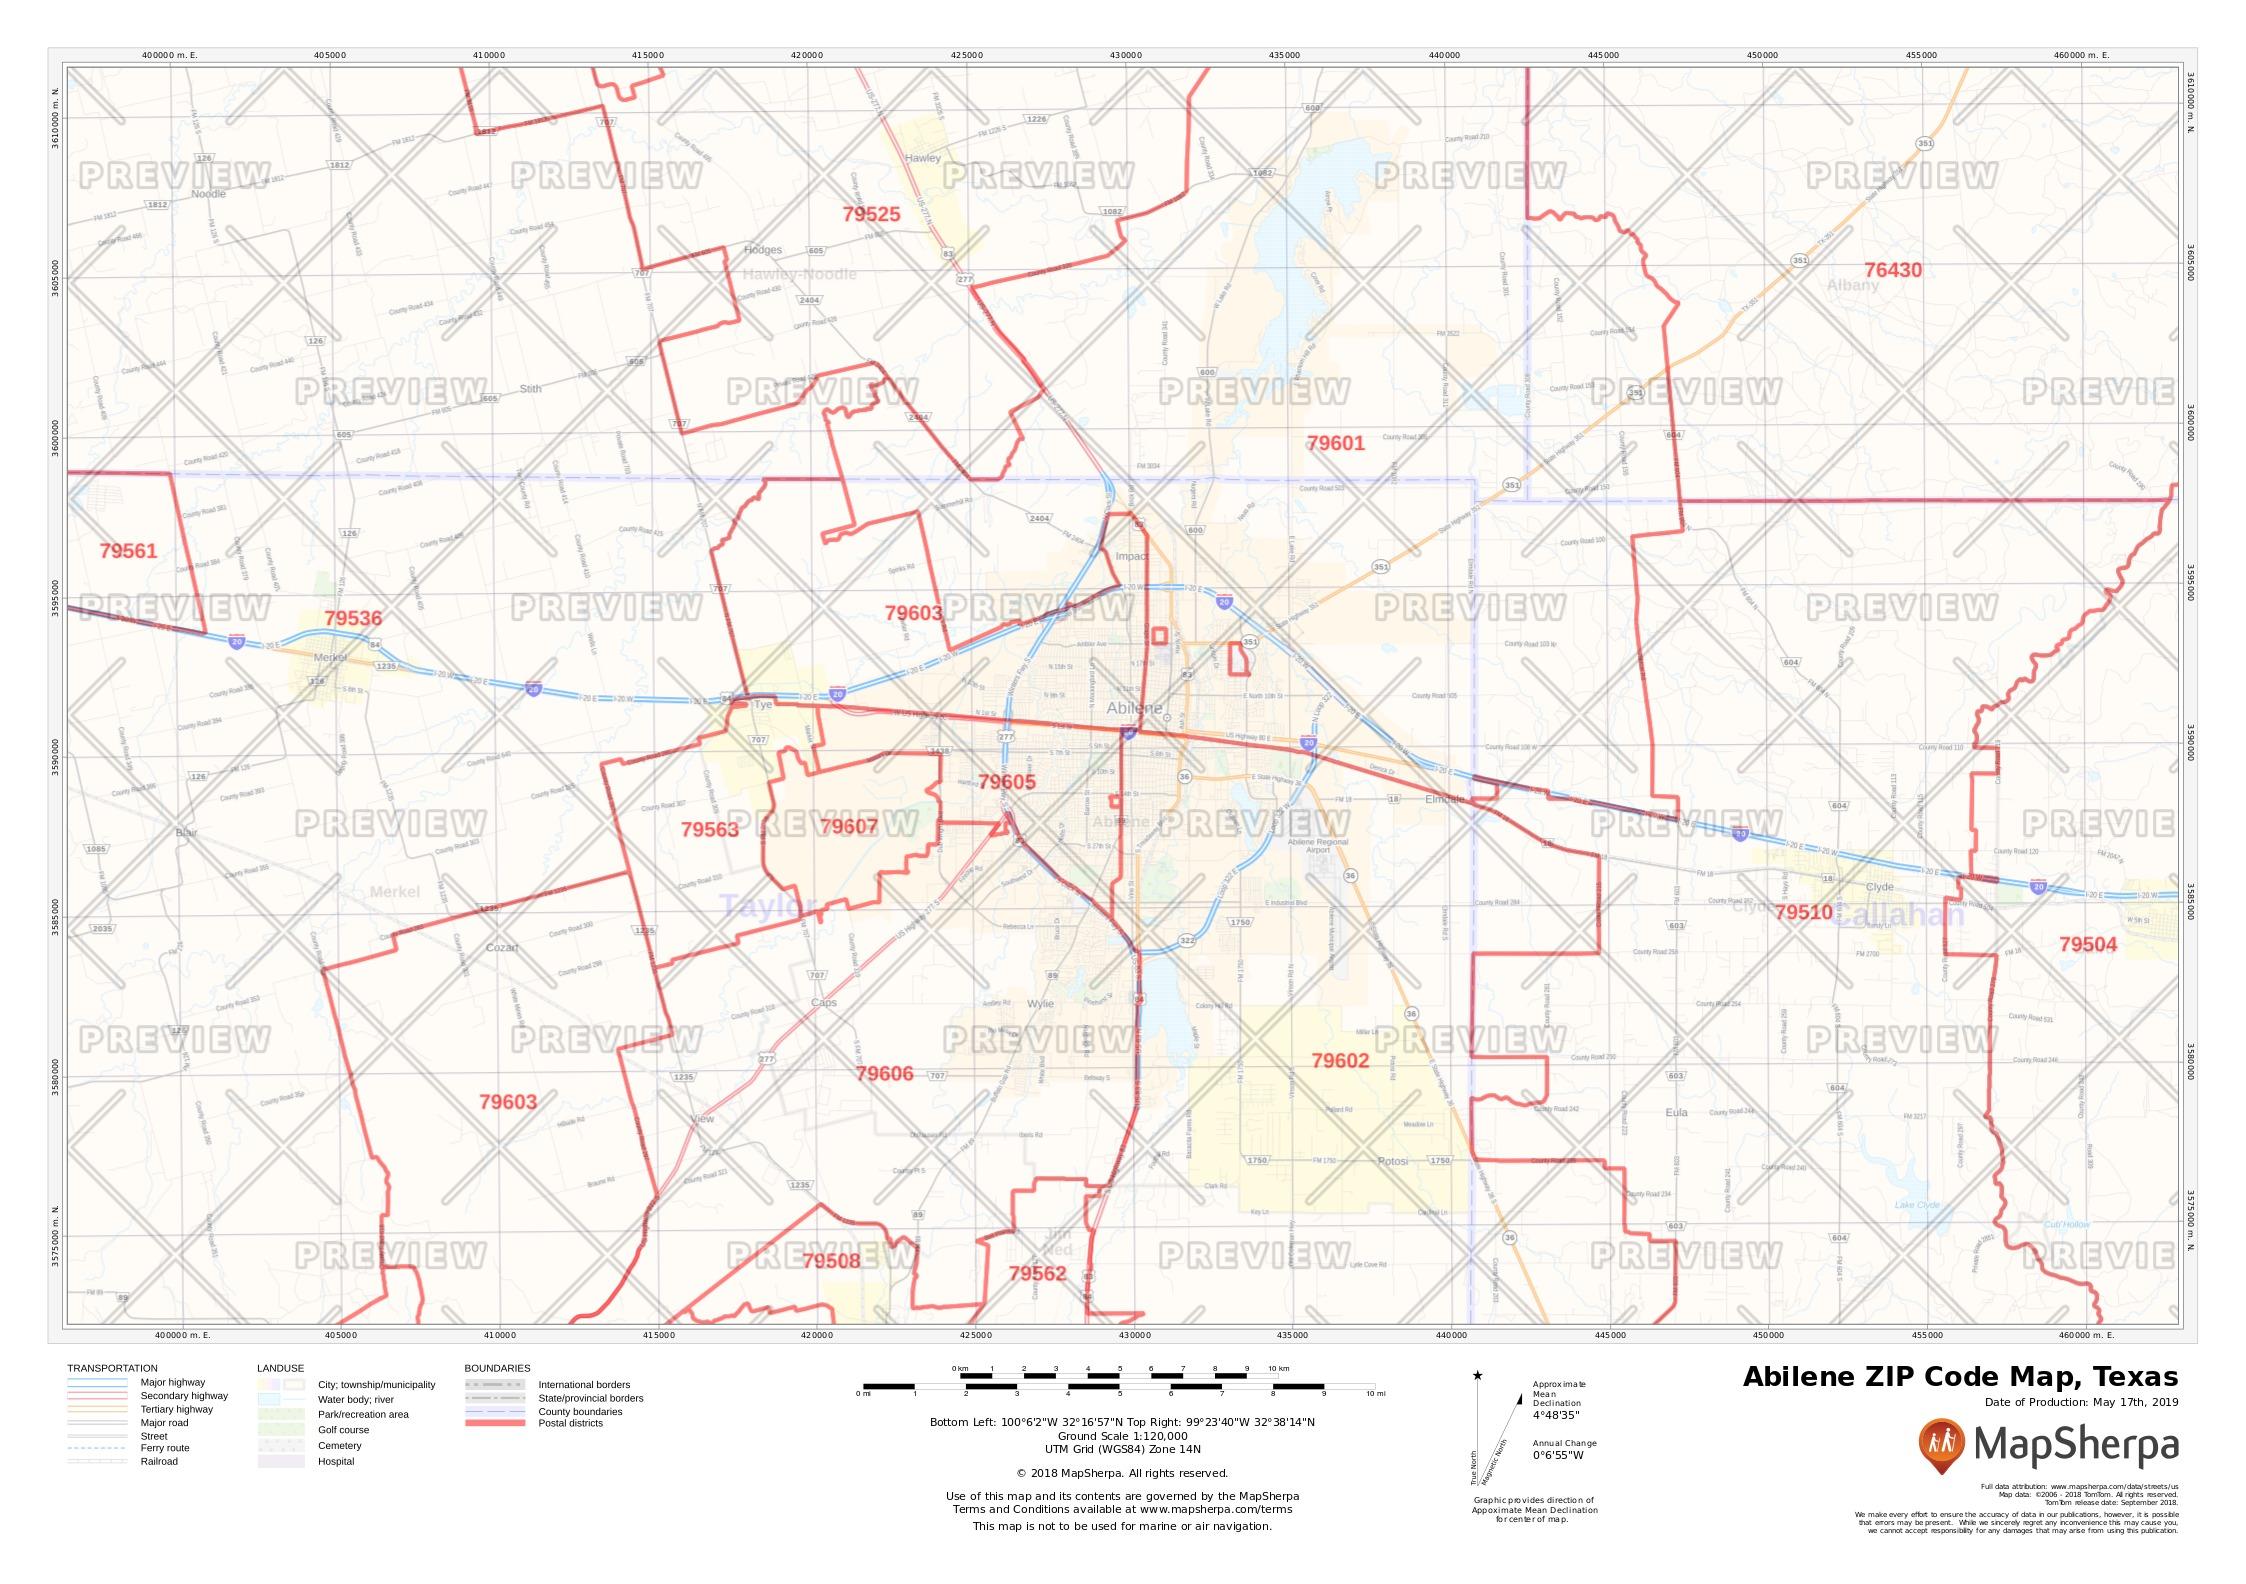 Abilene ZIP Code Map, Texas on time map, id map, landmark map, zip map, msa map, school map, latitude map, mobile map, region map, random map, mileage map, city limits map, map map, language map, state map, country map, birthday map,